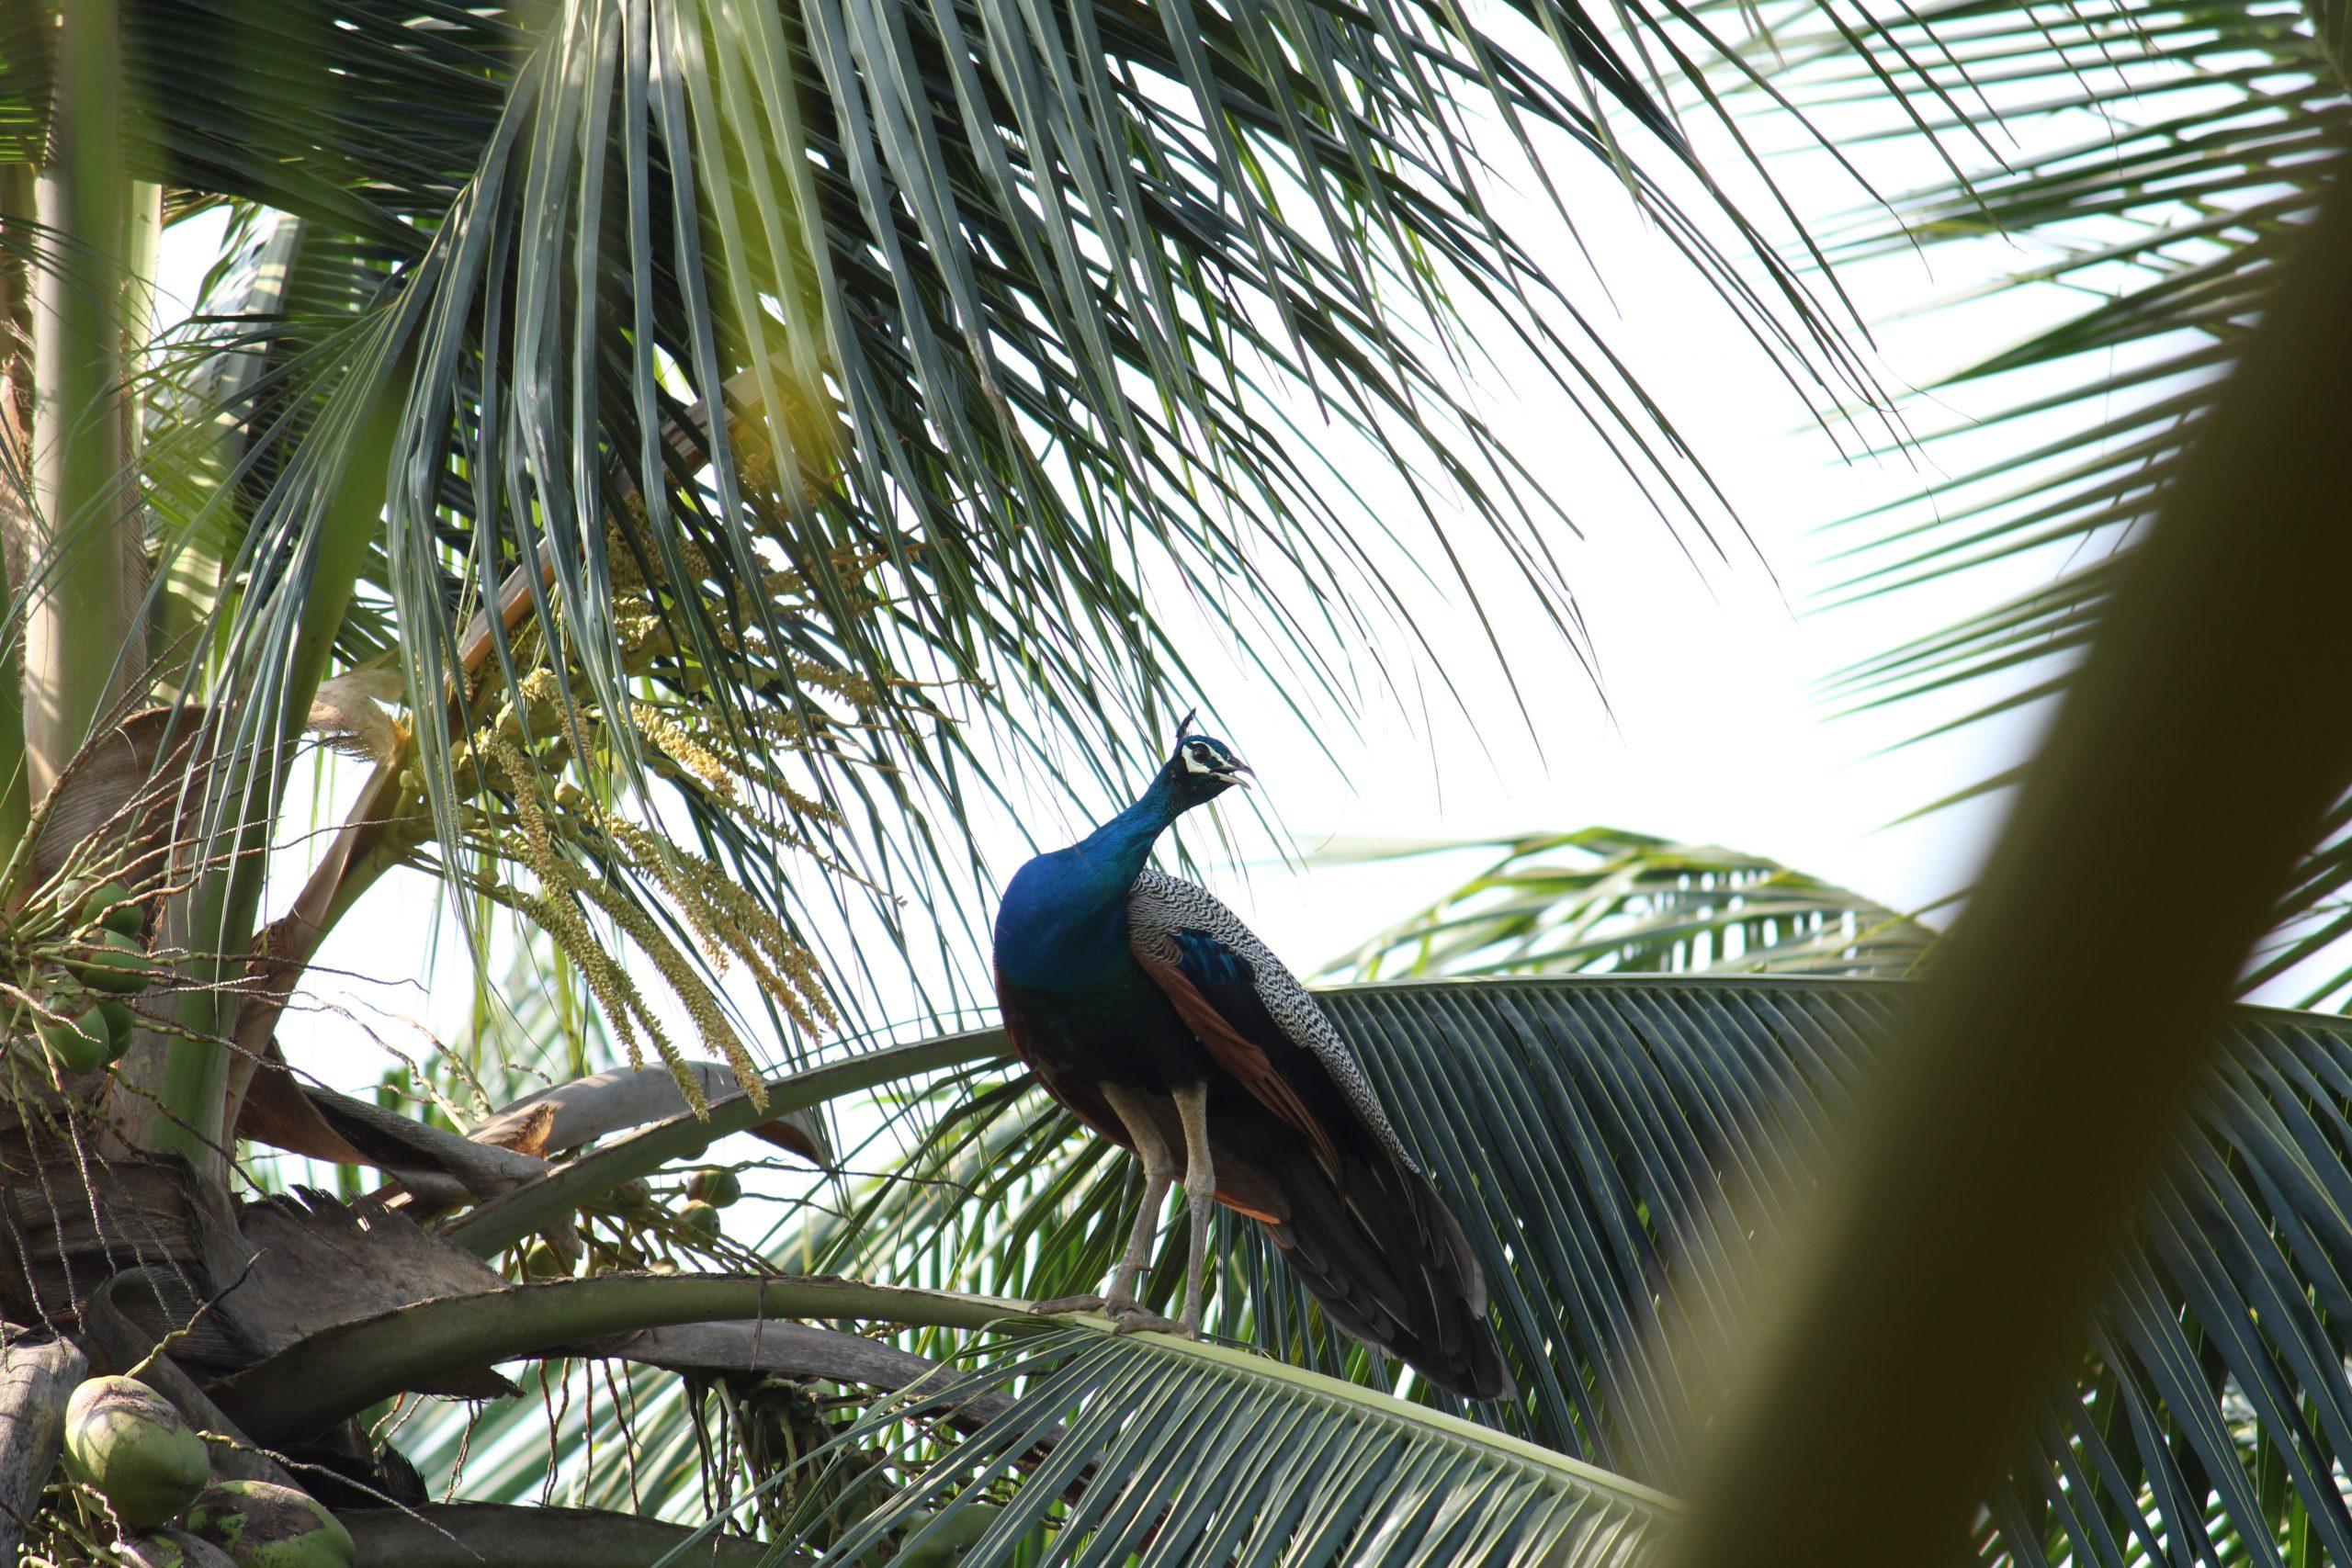 Peacock on coconut tree